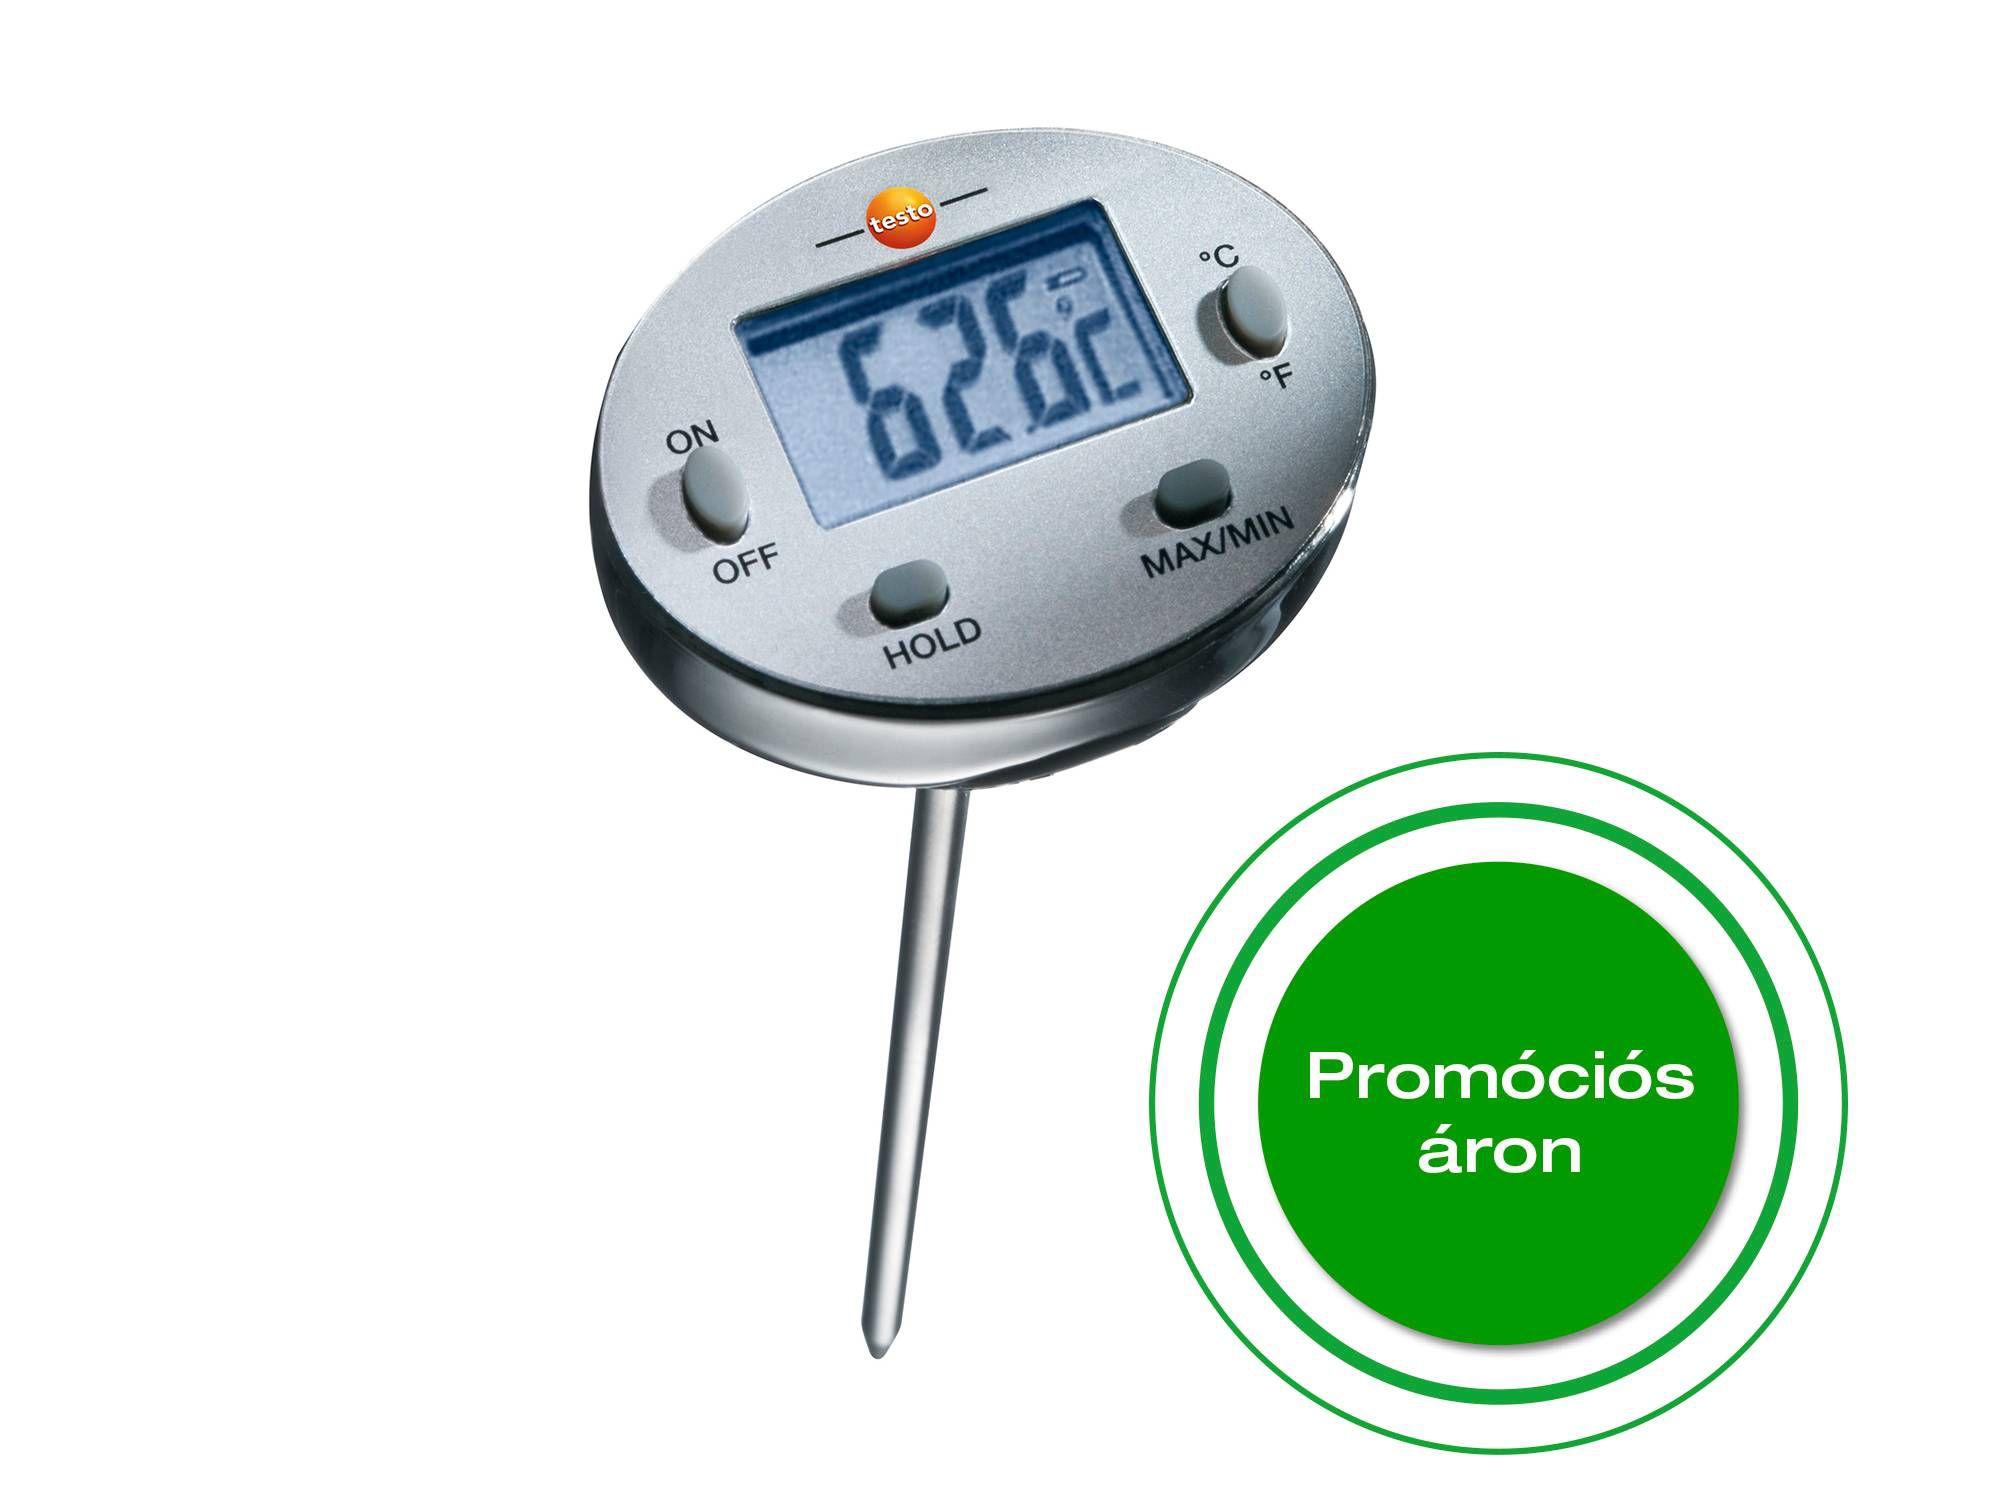 Waterproof mini probe thermometer